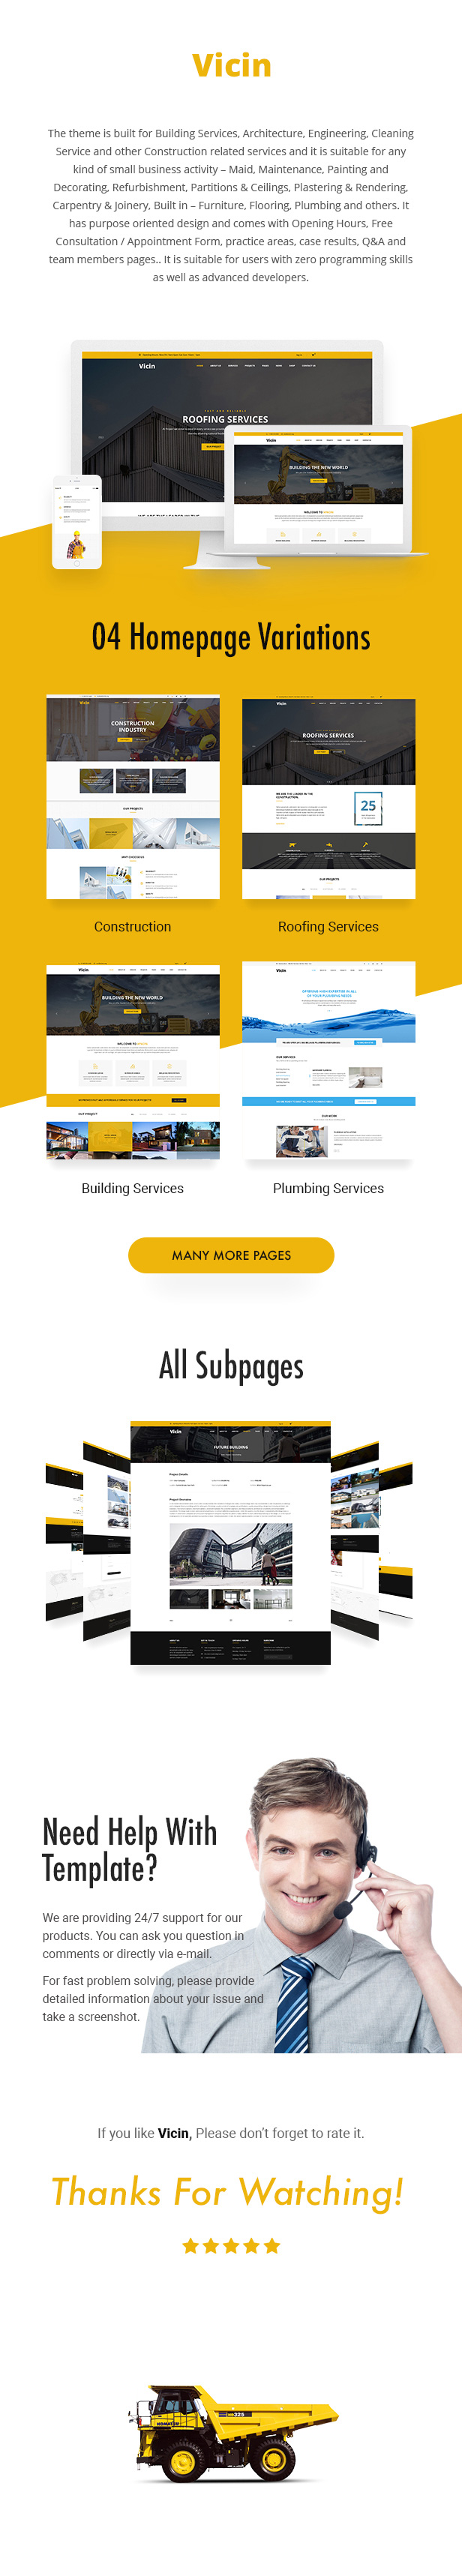 Vicin | Multipurpose Construction & Plumbing HTML Template - 2